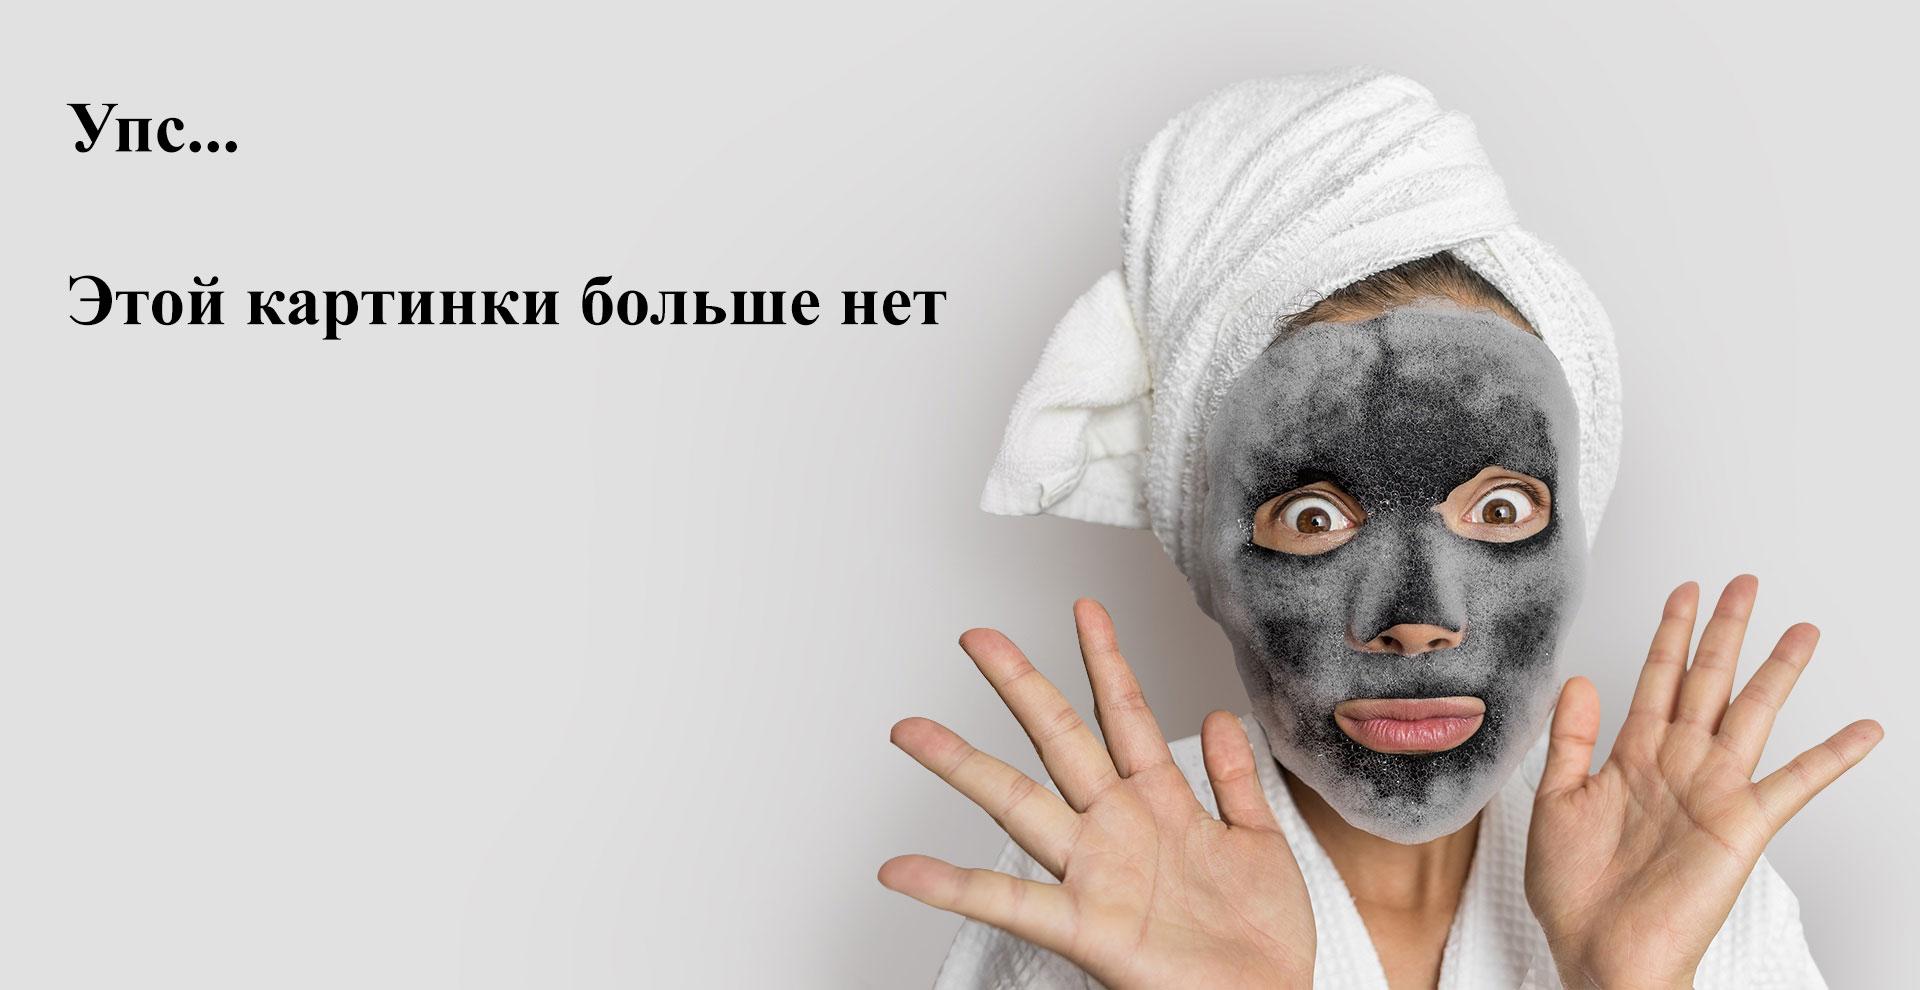 Patrisa Nail, Гель-лак Московская сага №763